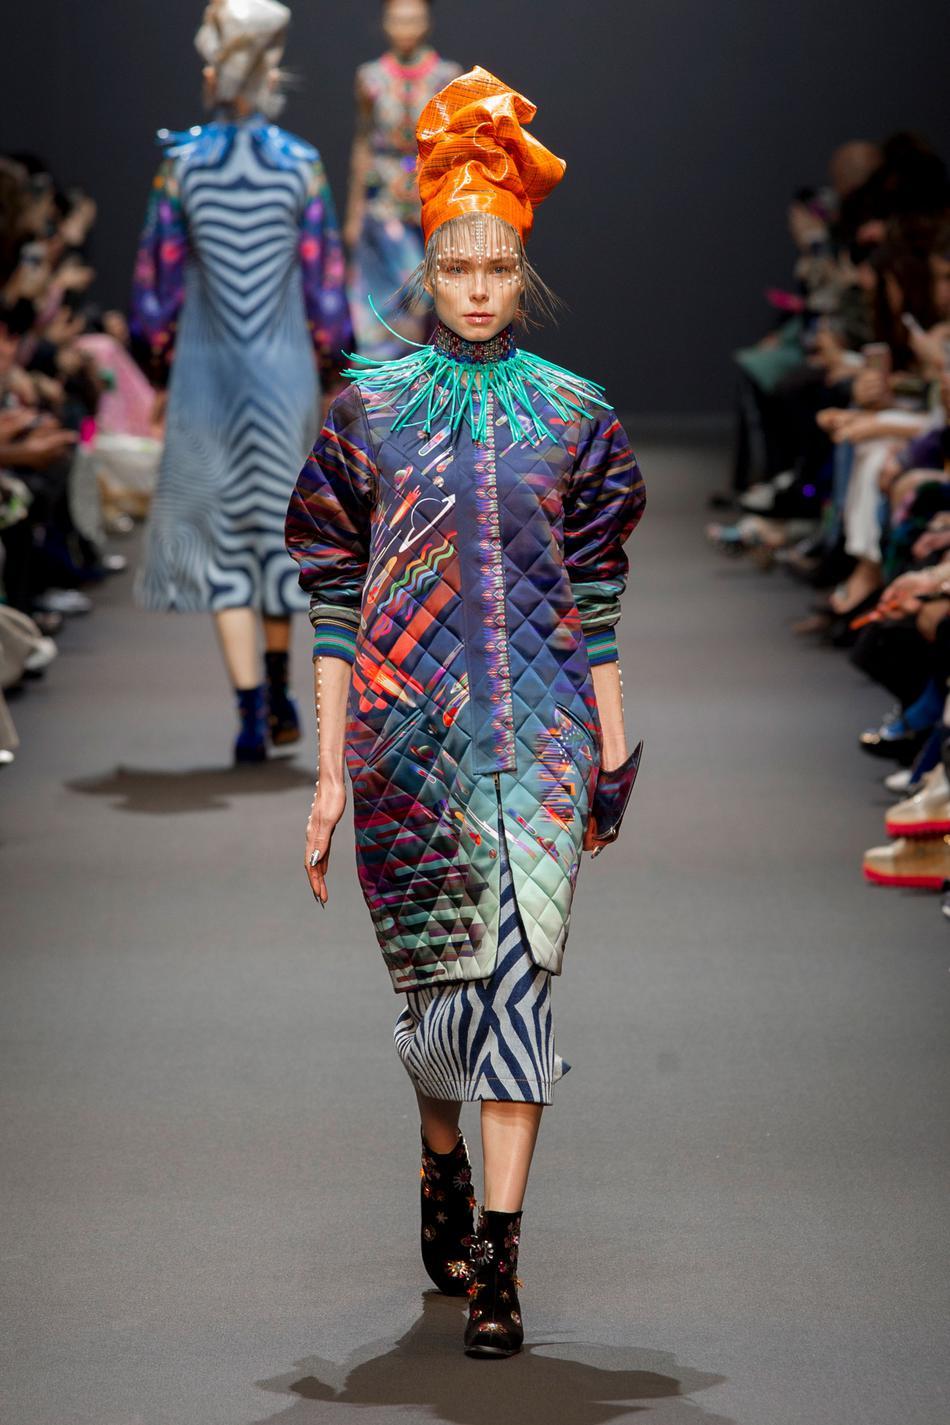 Défilé Manish Arora Fashion Week 2017 - Look 2